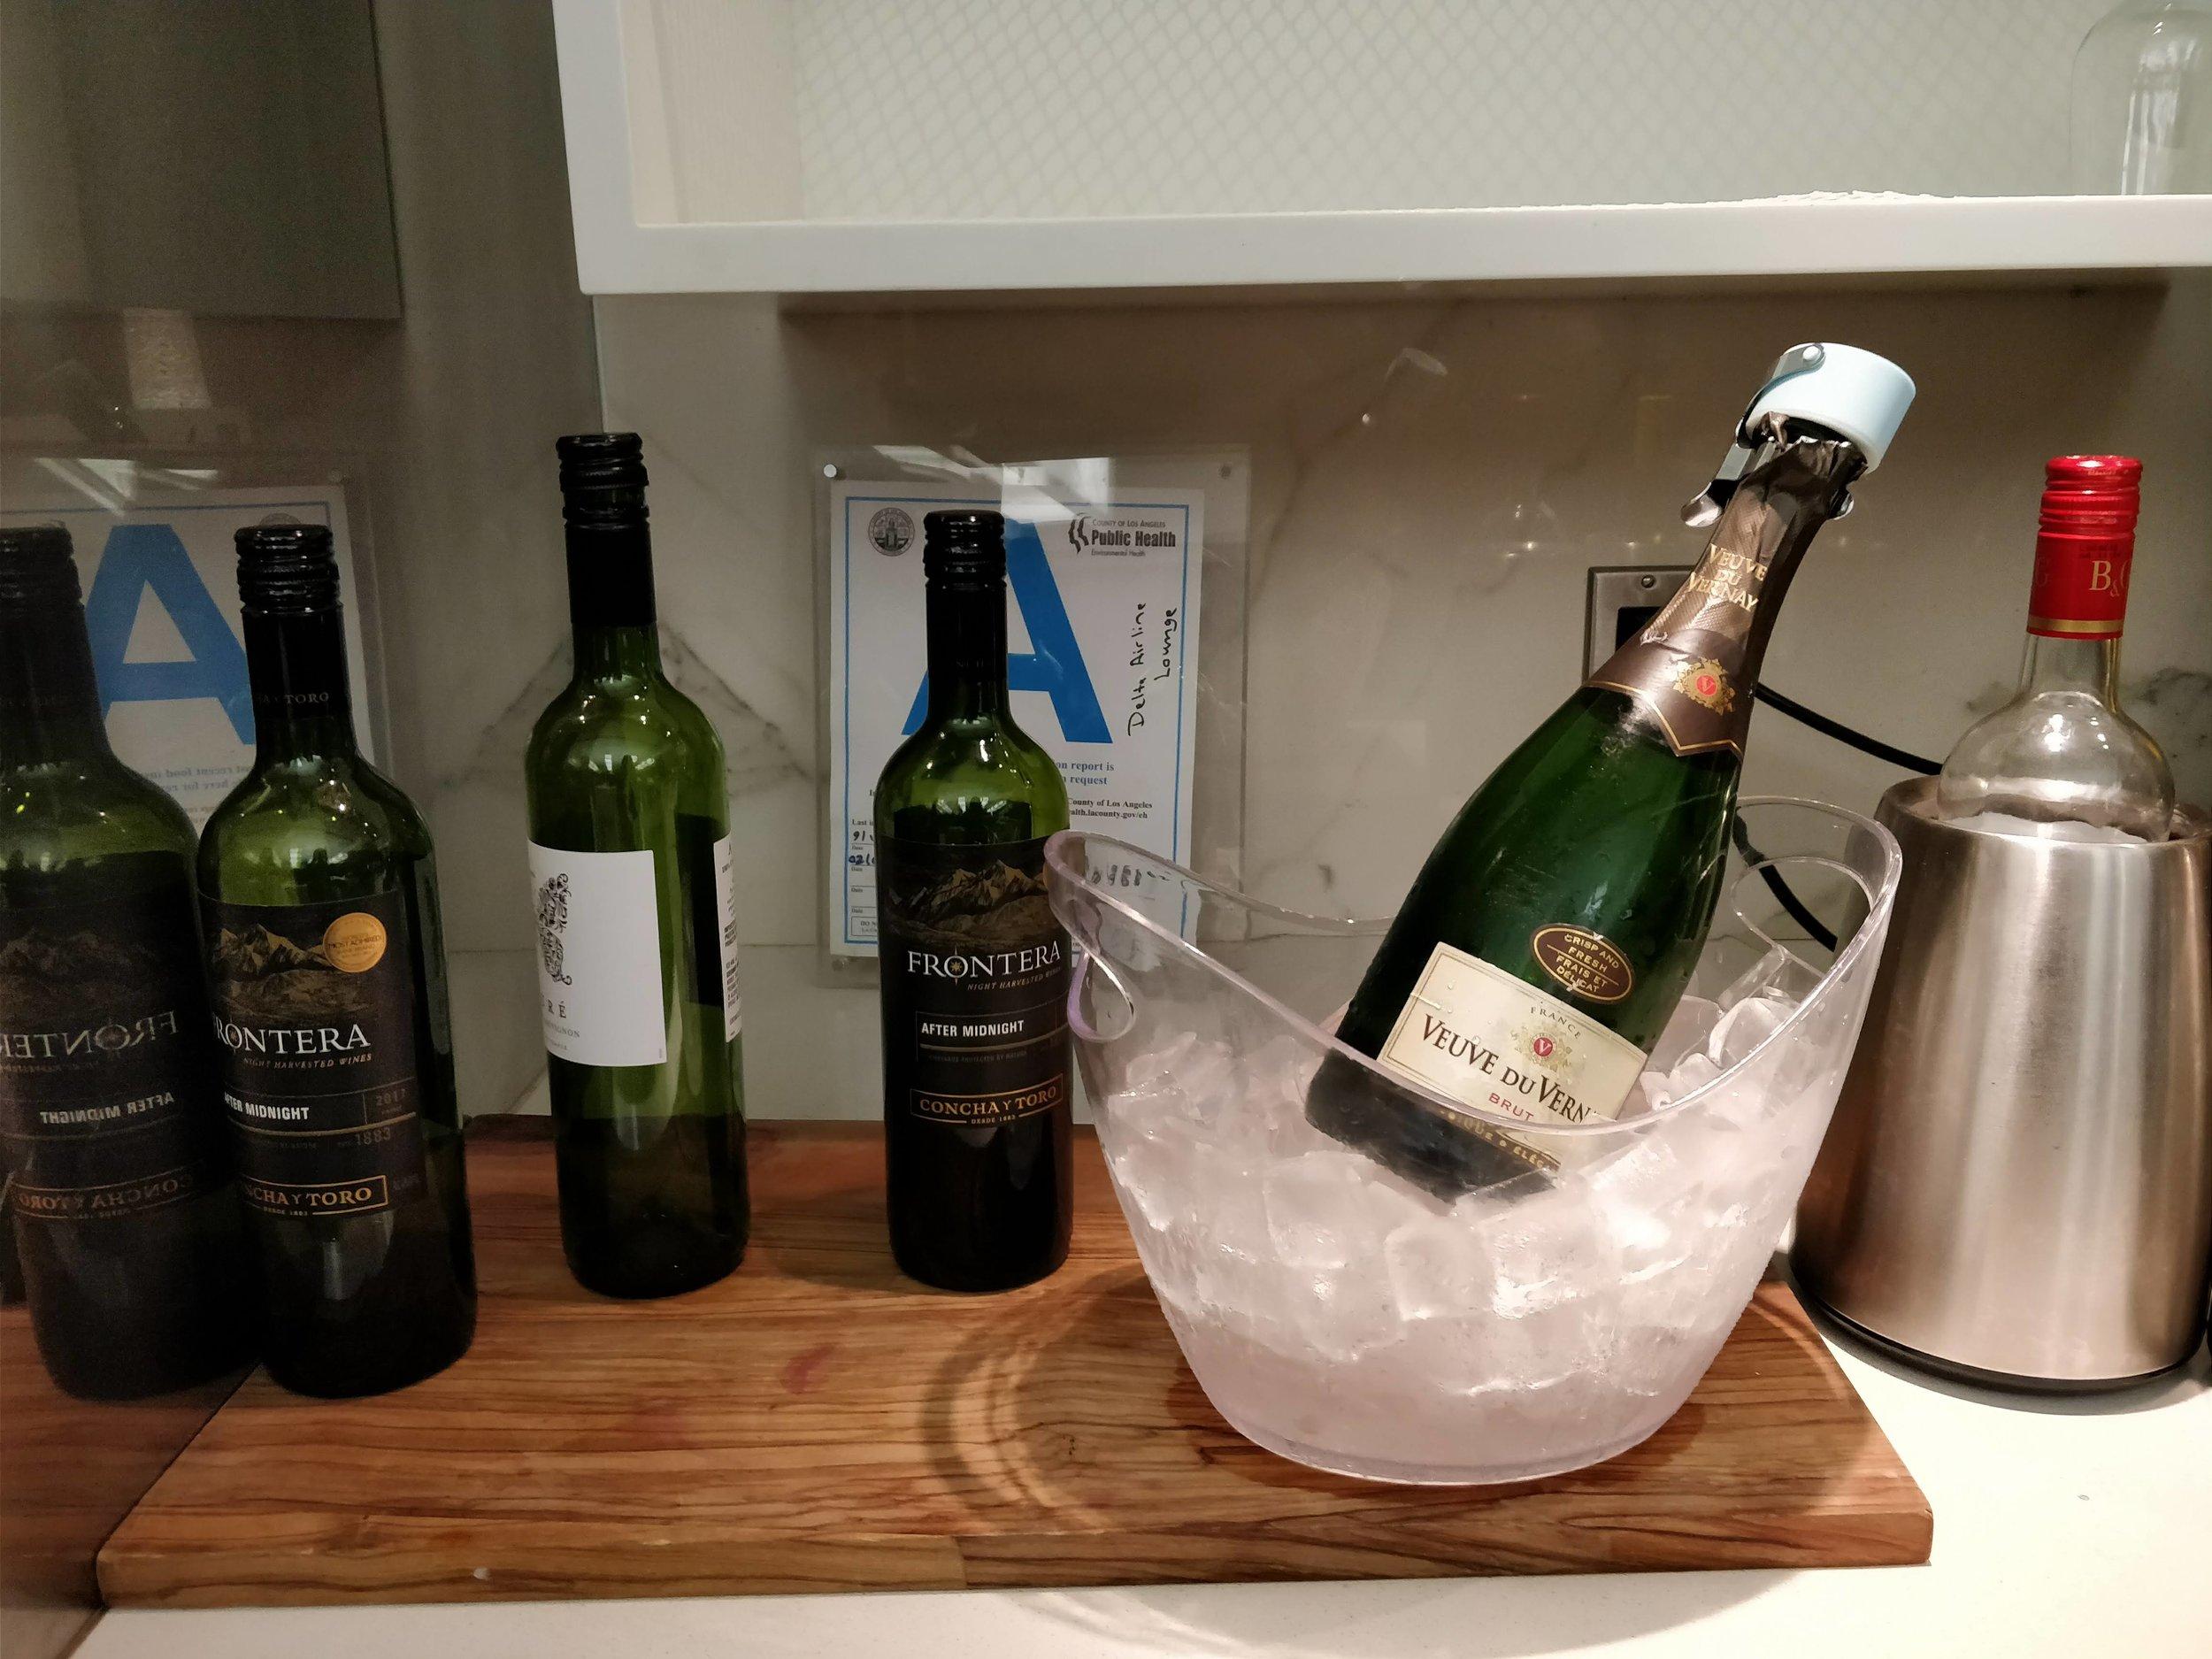 wine and brut